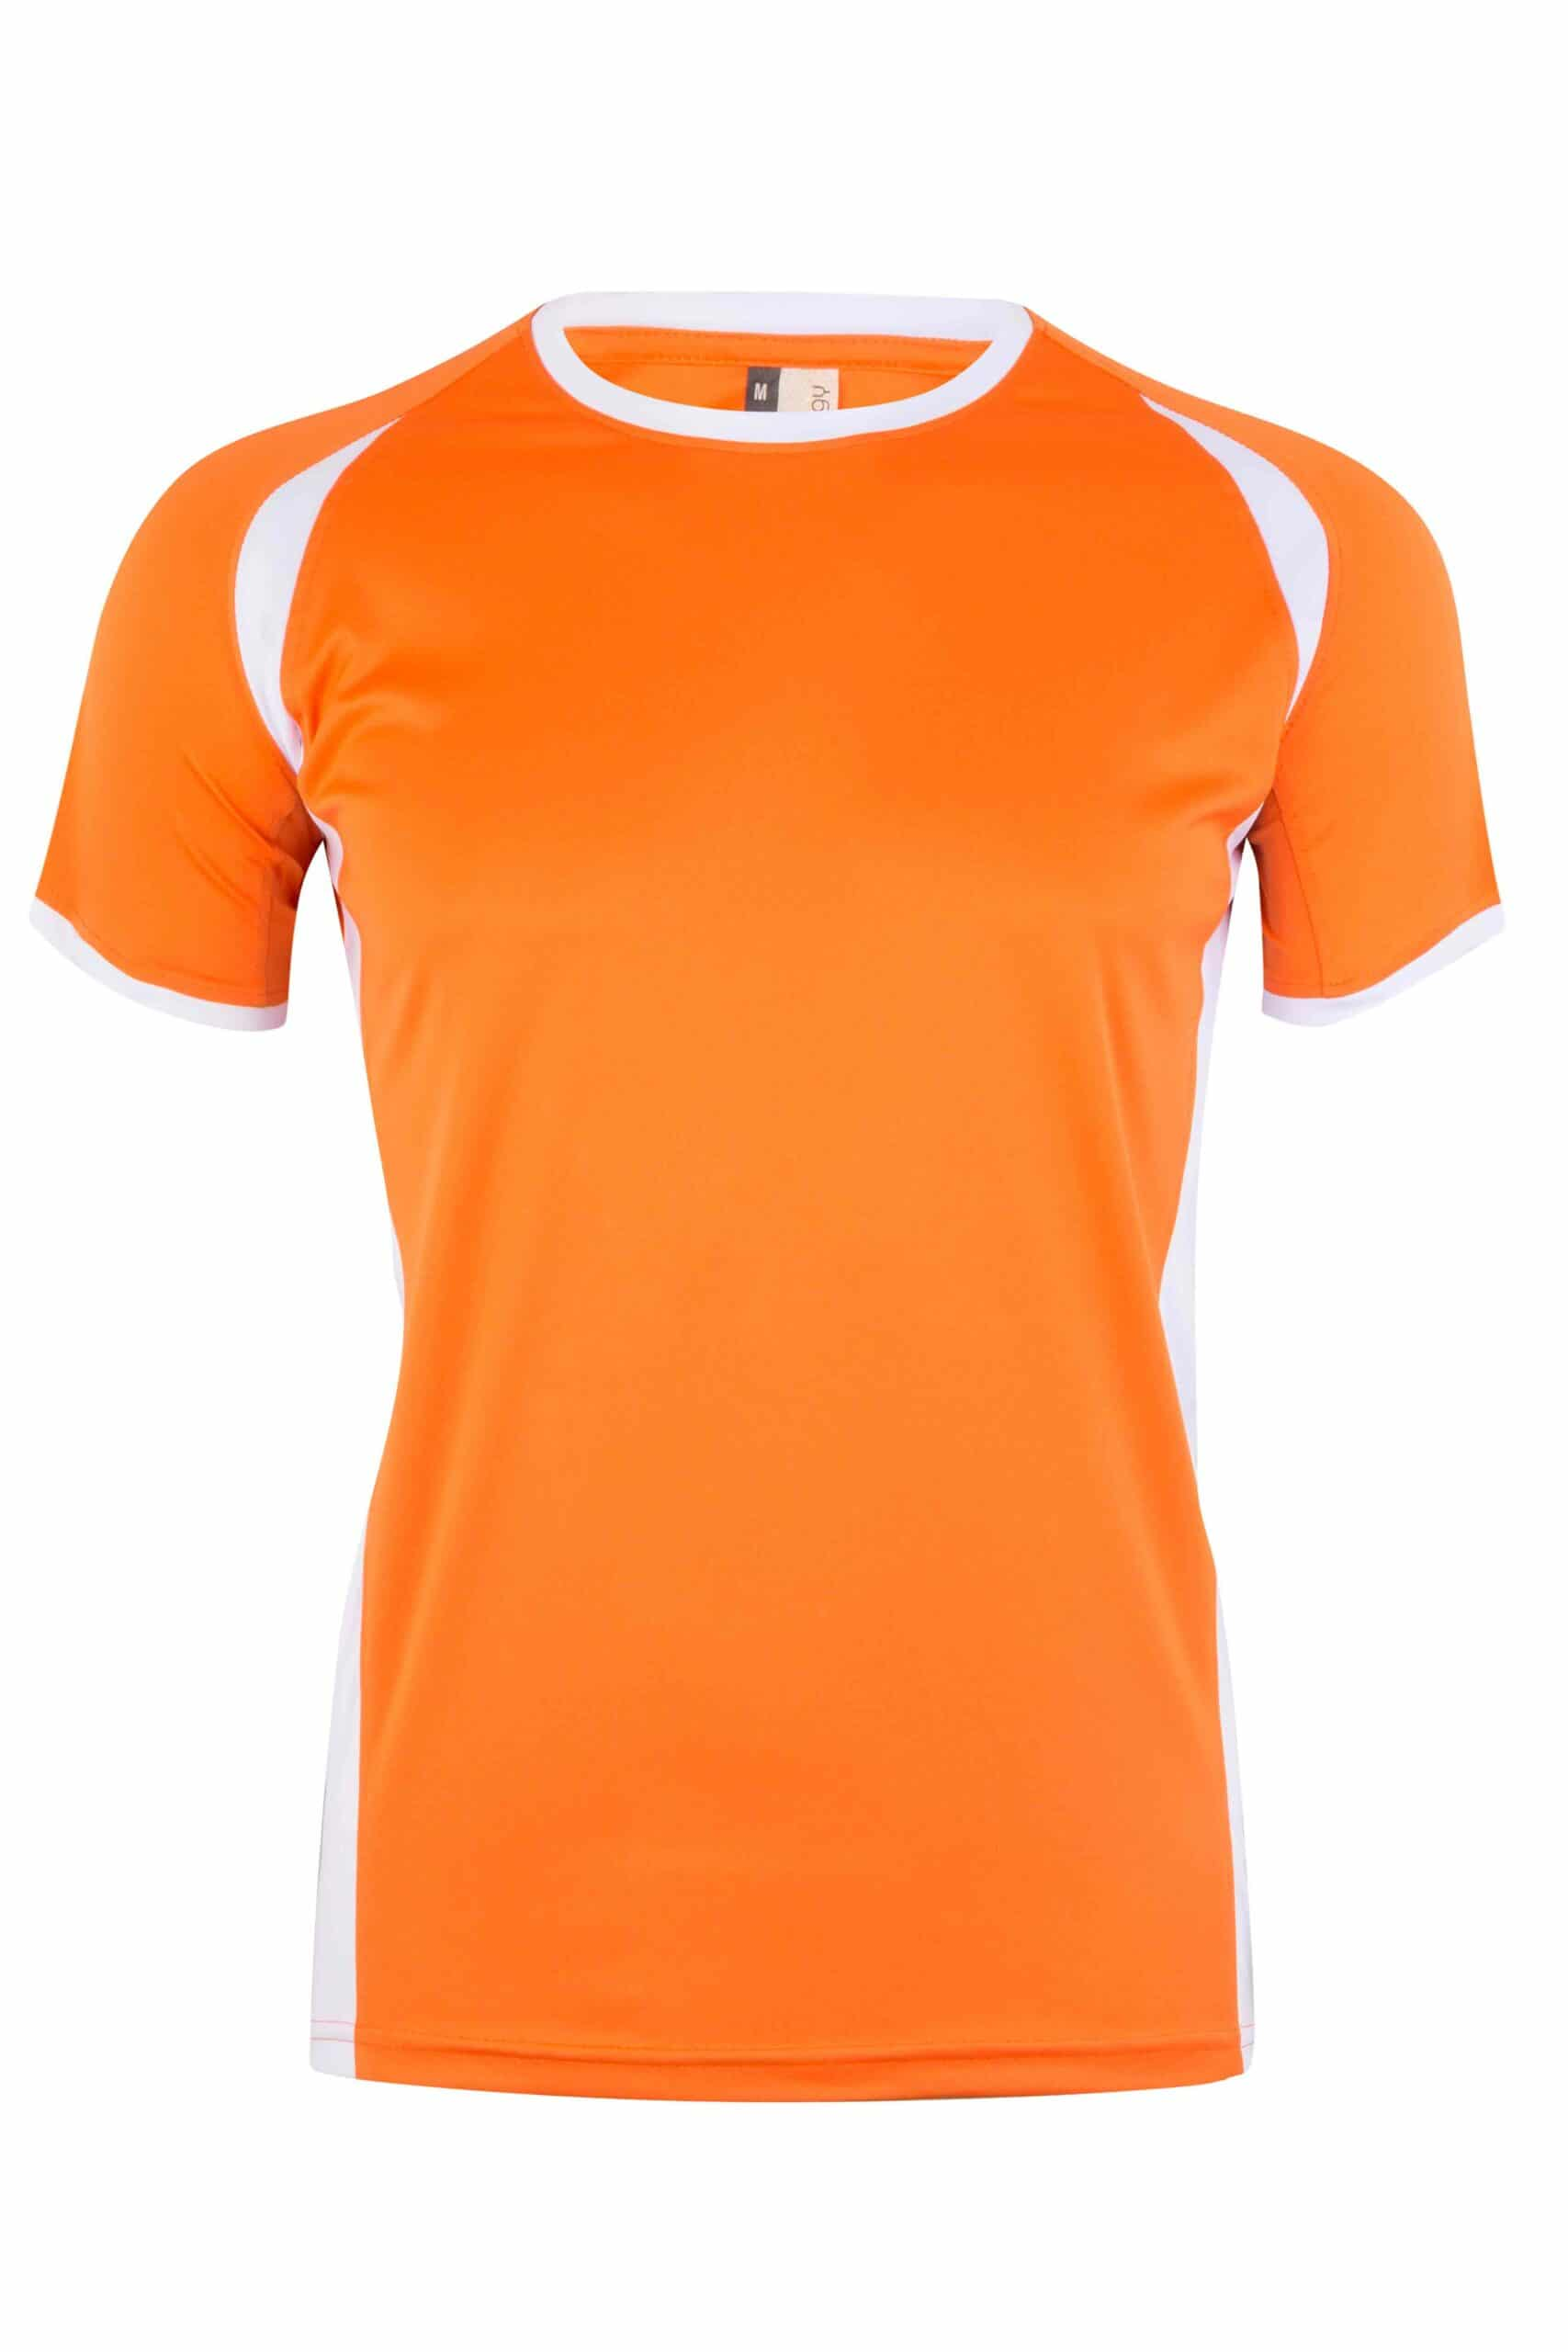 Mukua Mk530v Mukua Camiseta TÉcnica Manga Corta Bicolor Orange White 1